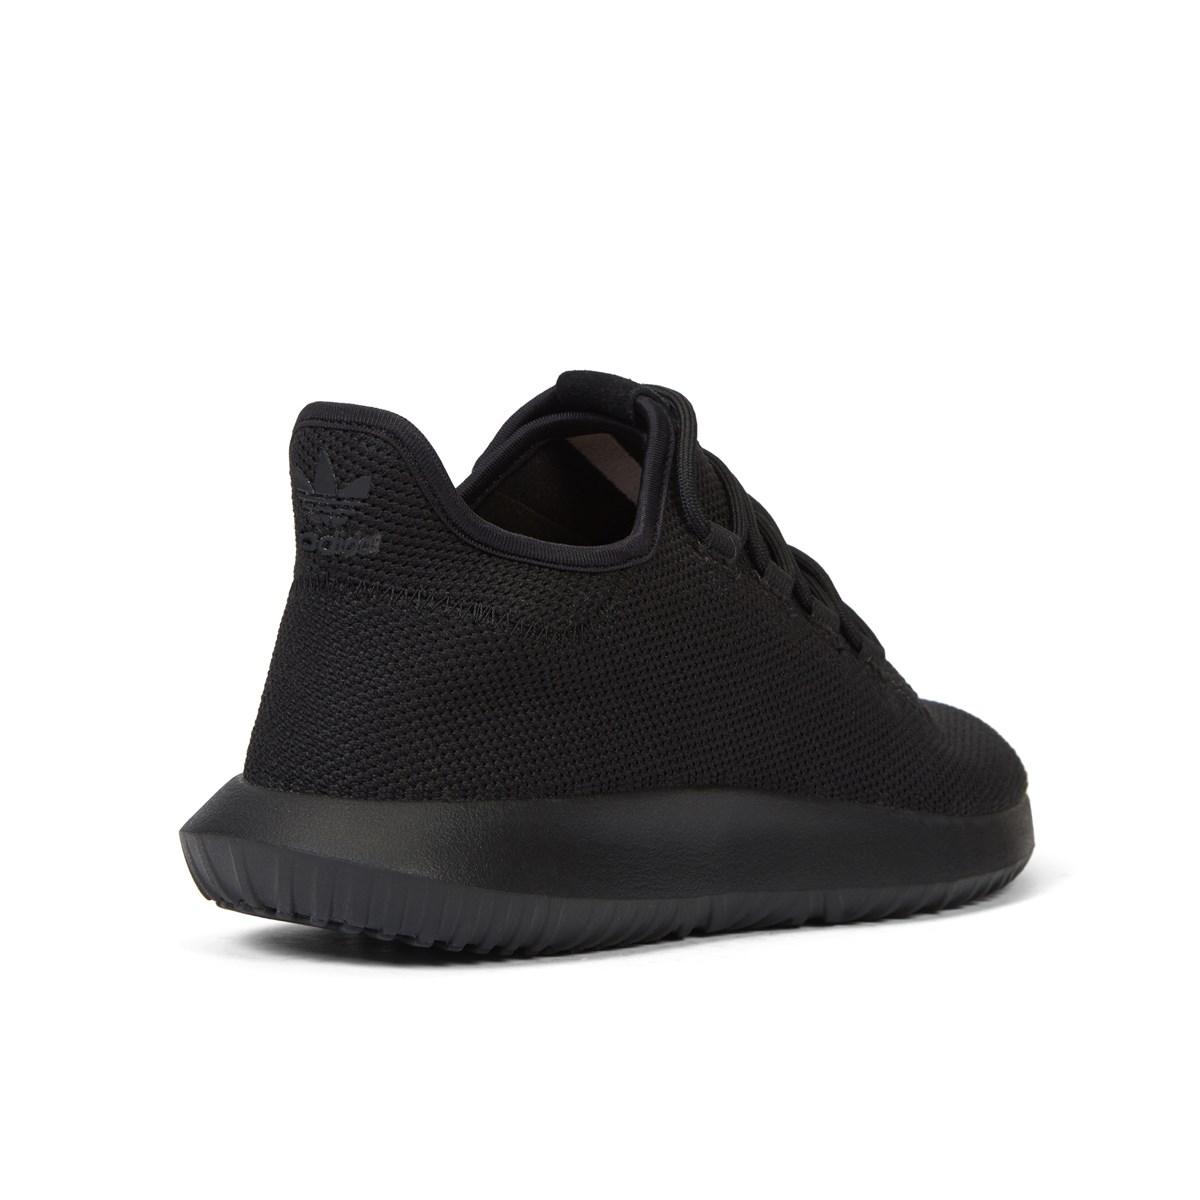 Adidas Rørformet Skygge Menn 10,5